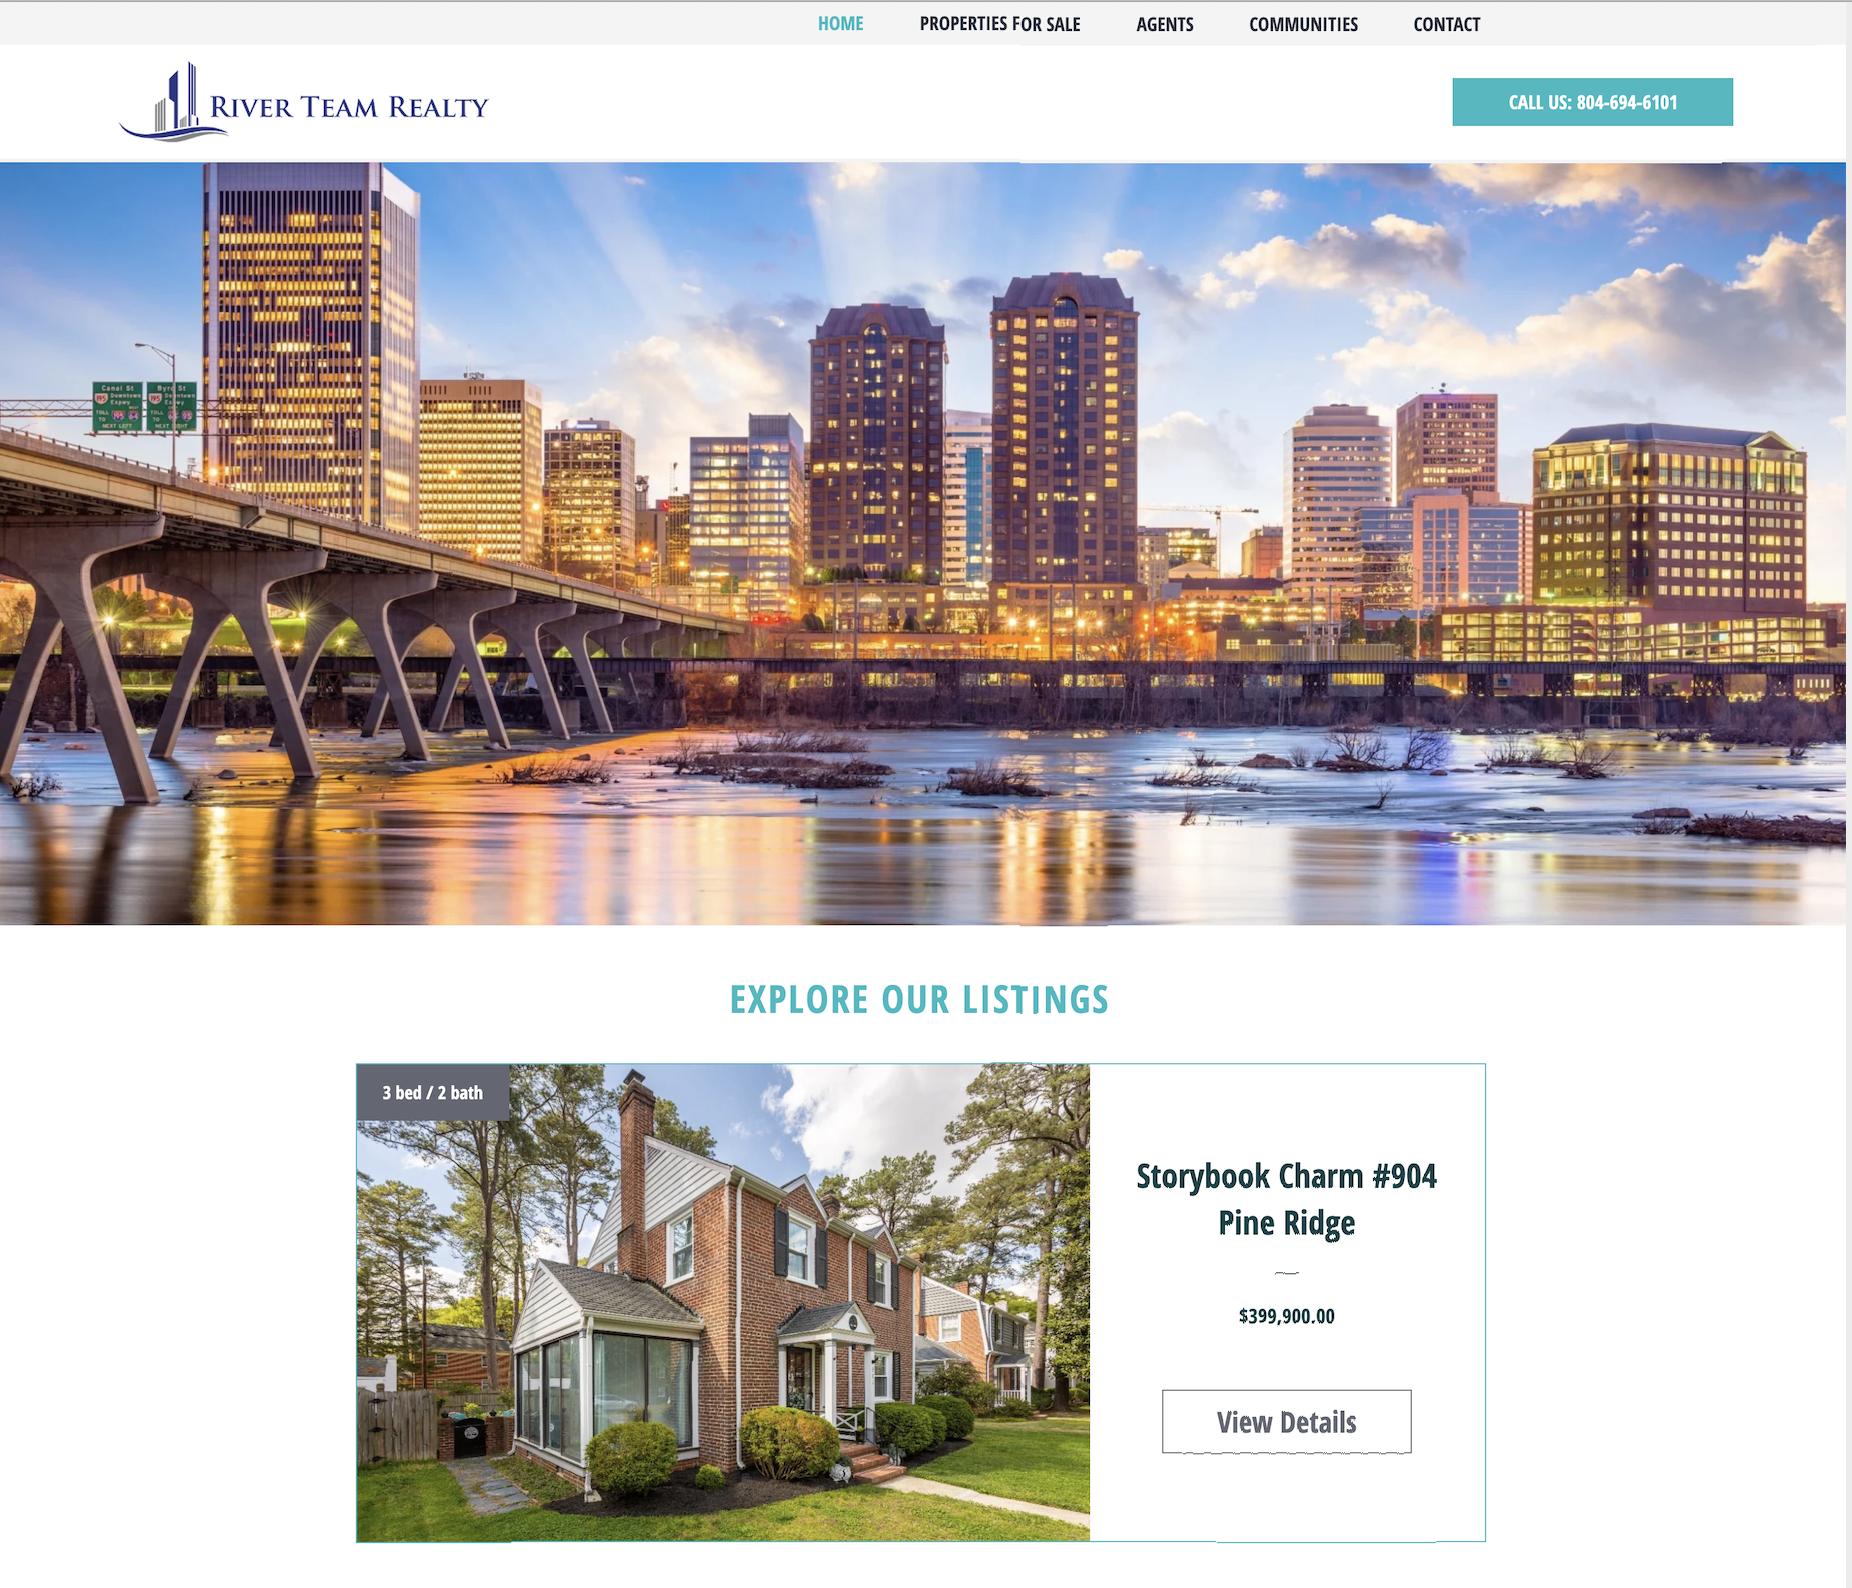 Real Estate Company Website Website for a Real Estate Broker in Virginia